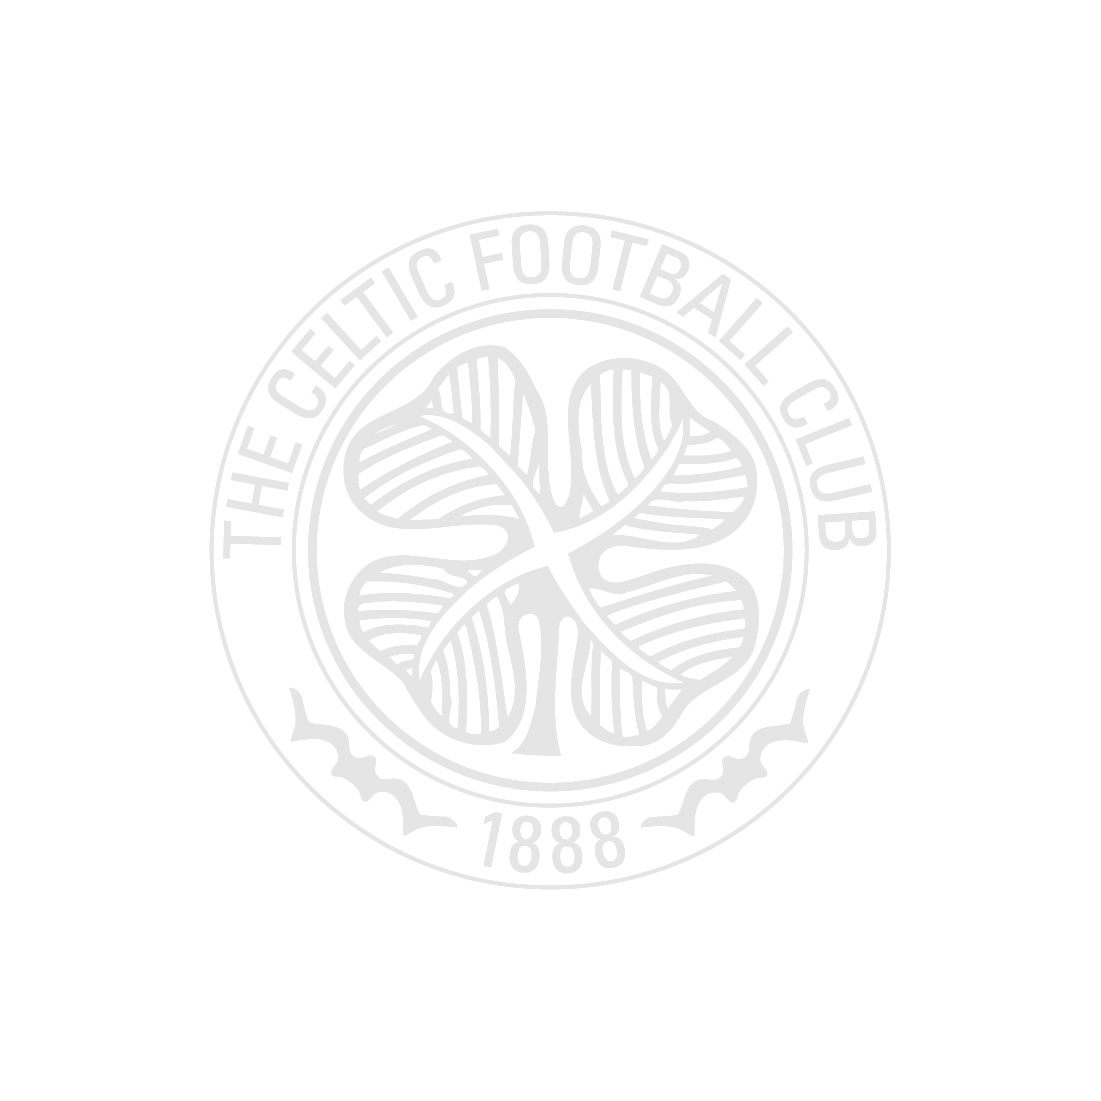 Celtic FC Womens 20/21 Home Shirt with Sponsor